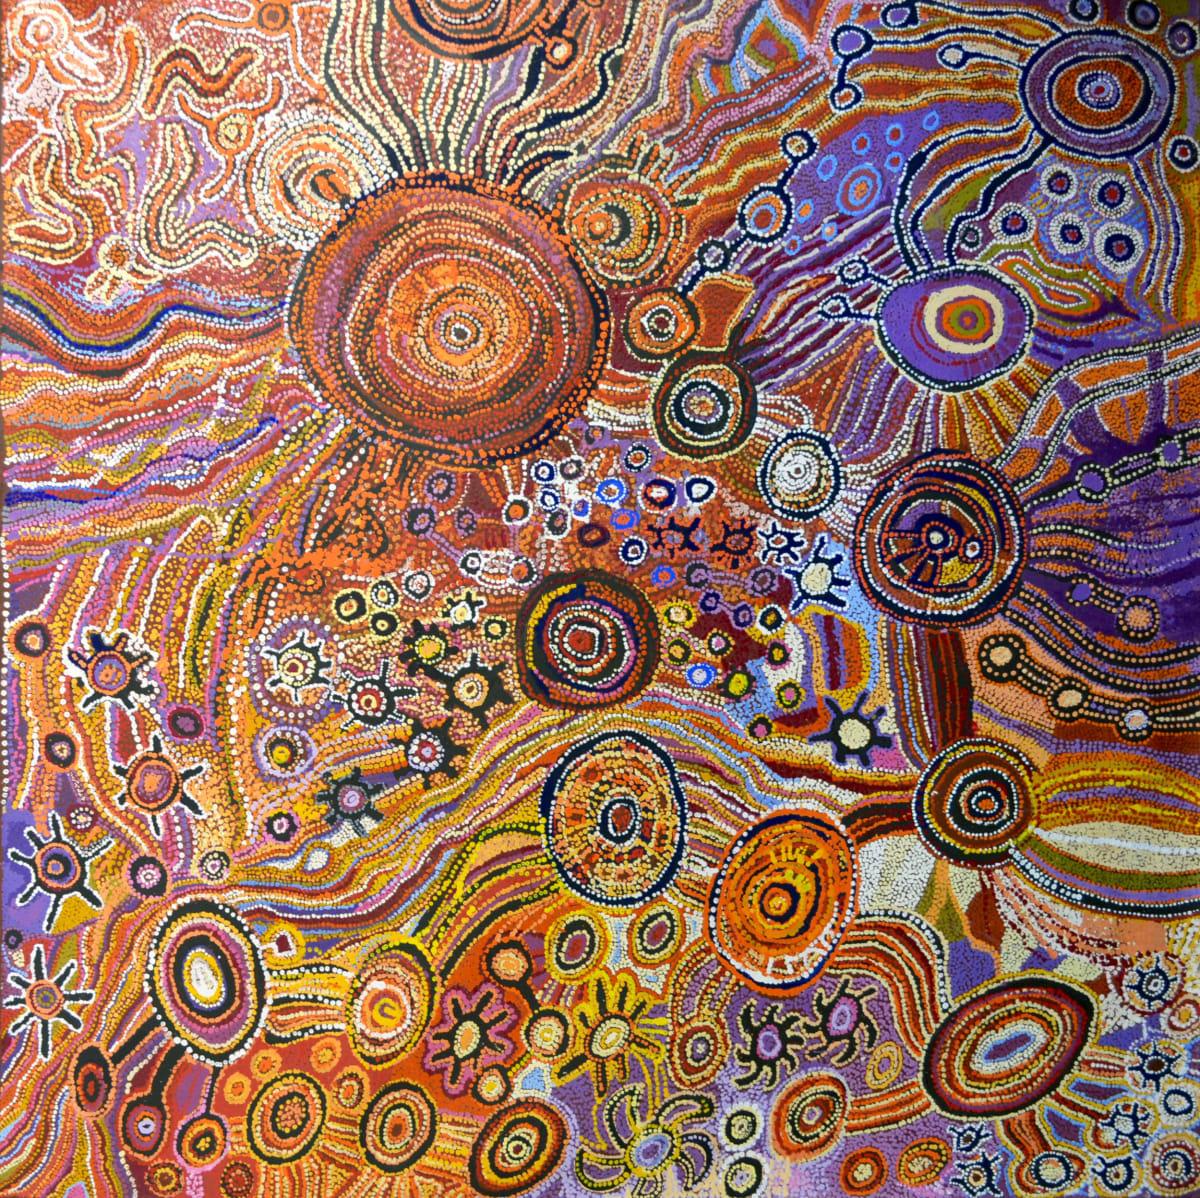 Senior Women's Collaborative - Kalkitji Untitled acrylic on linen 200 x 200 cm